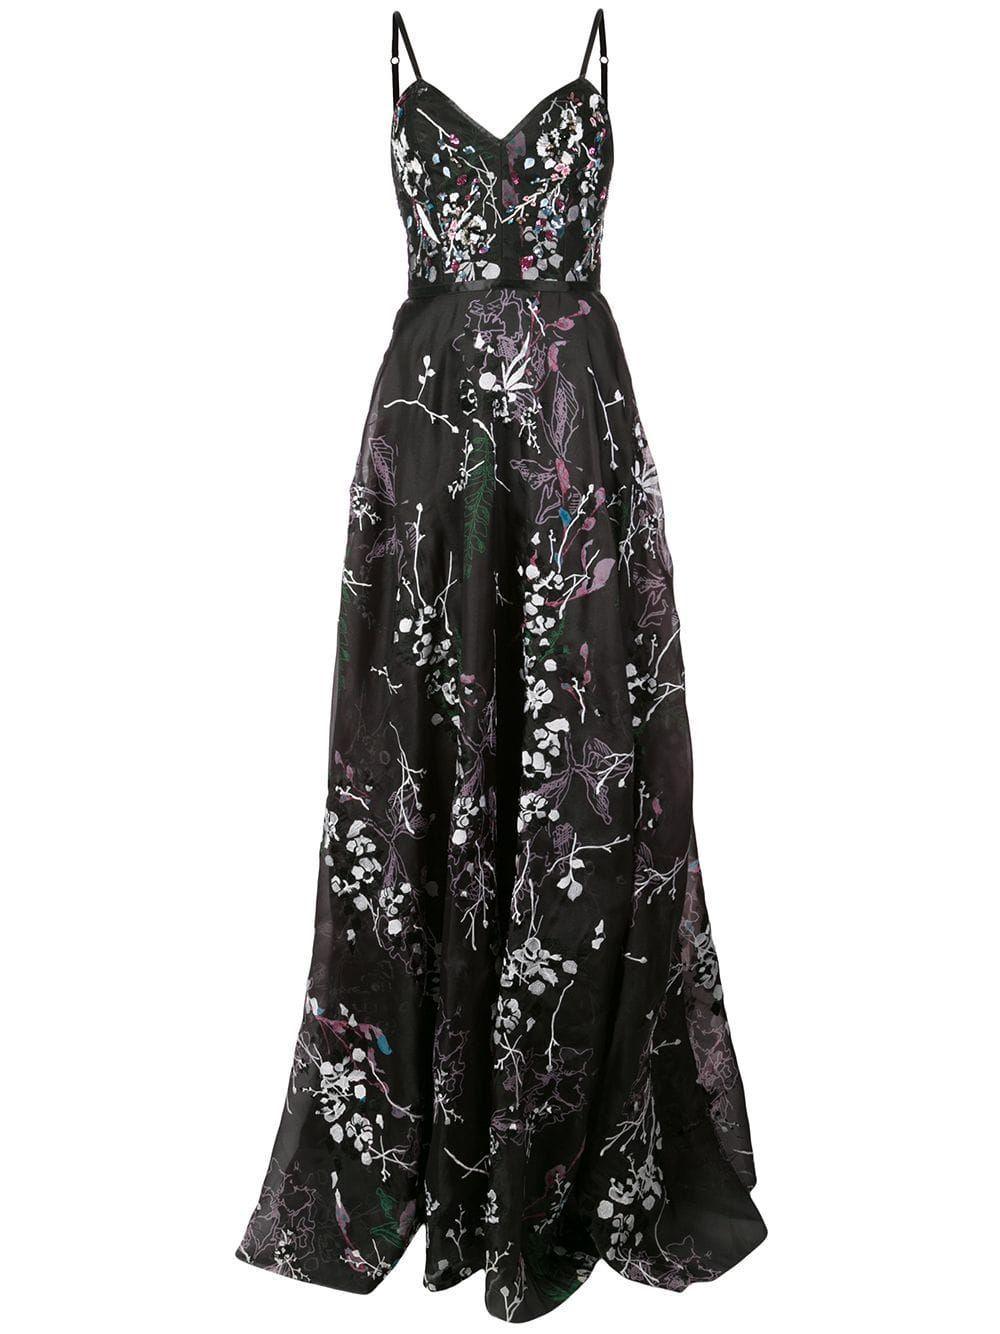 4c7c88273de Marchesa Notte floral embroidered gown - Black em 2019 | My Polyvore ...